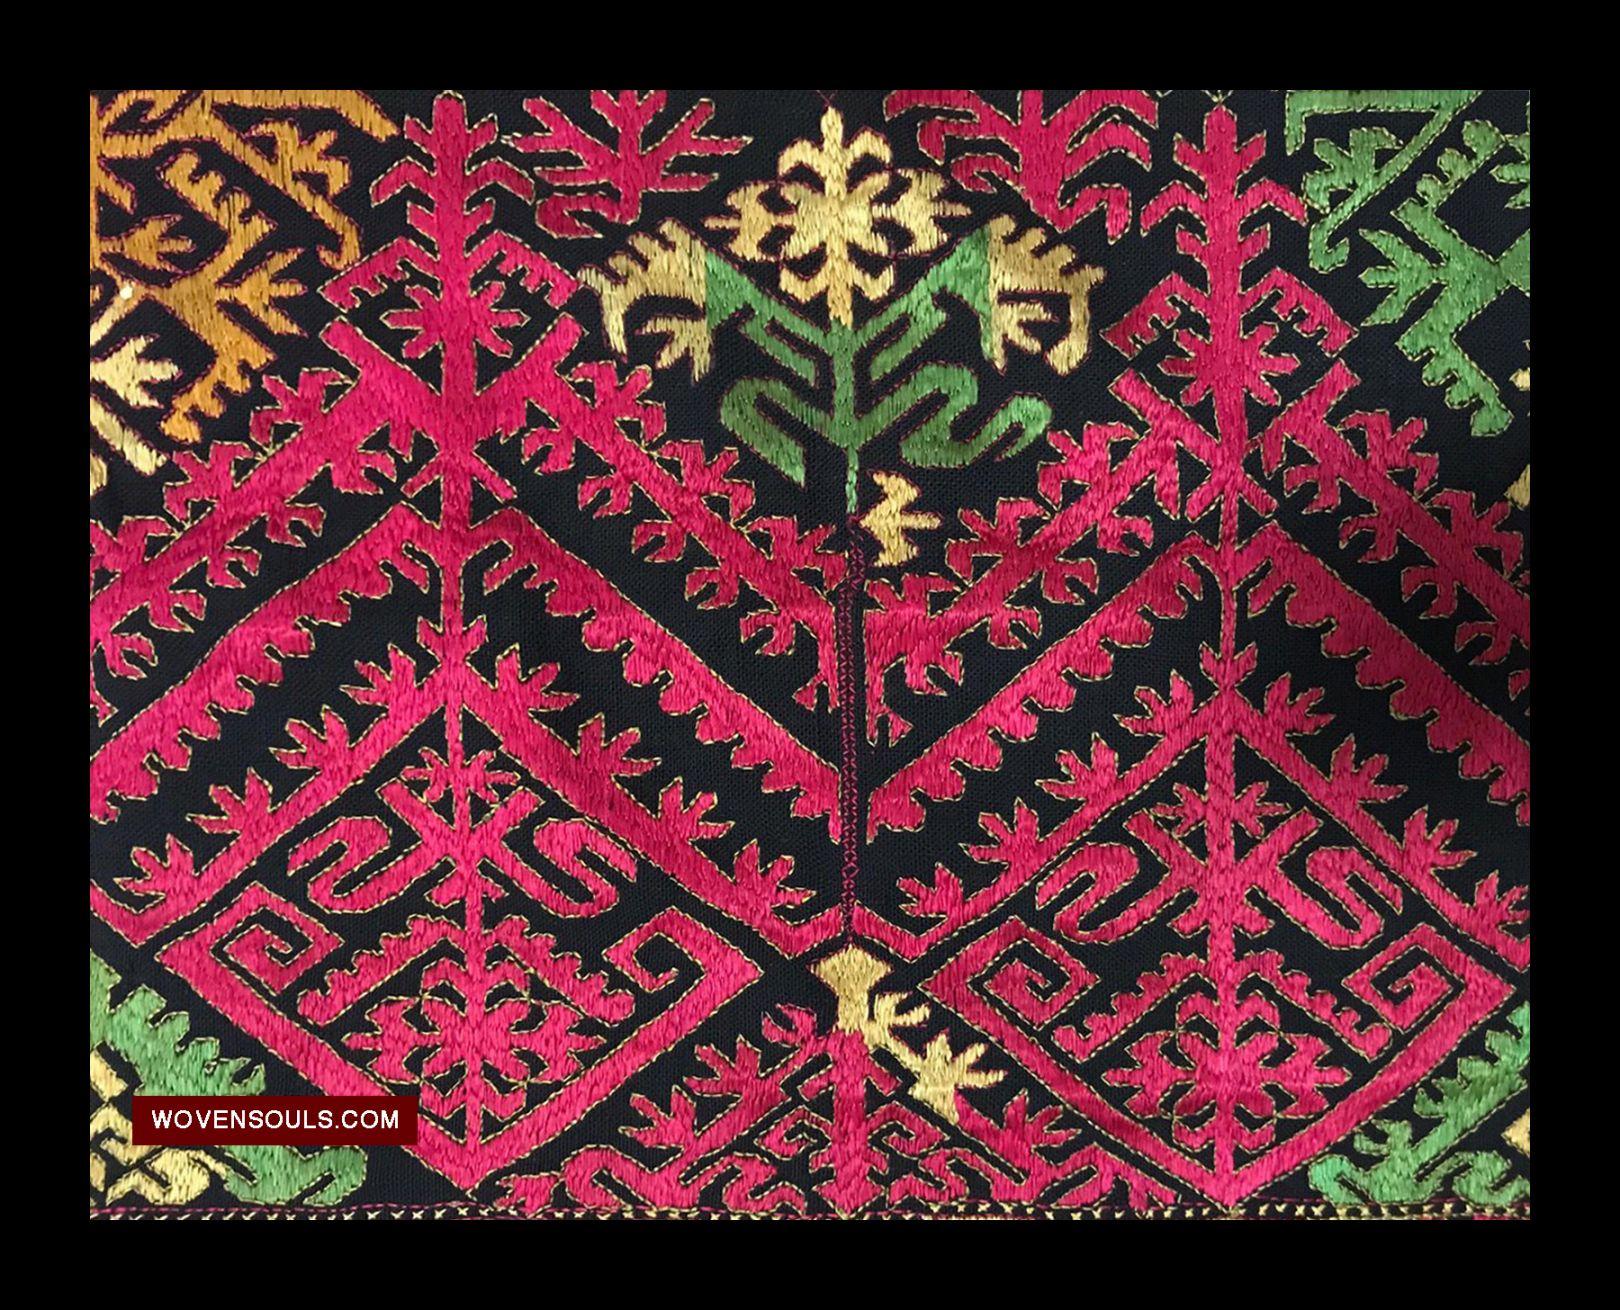 1351 Antique Kohistan Textile Embroidery Panel Mas